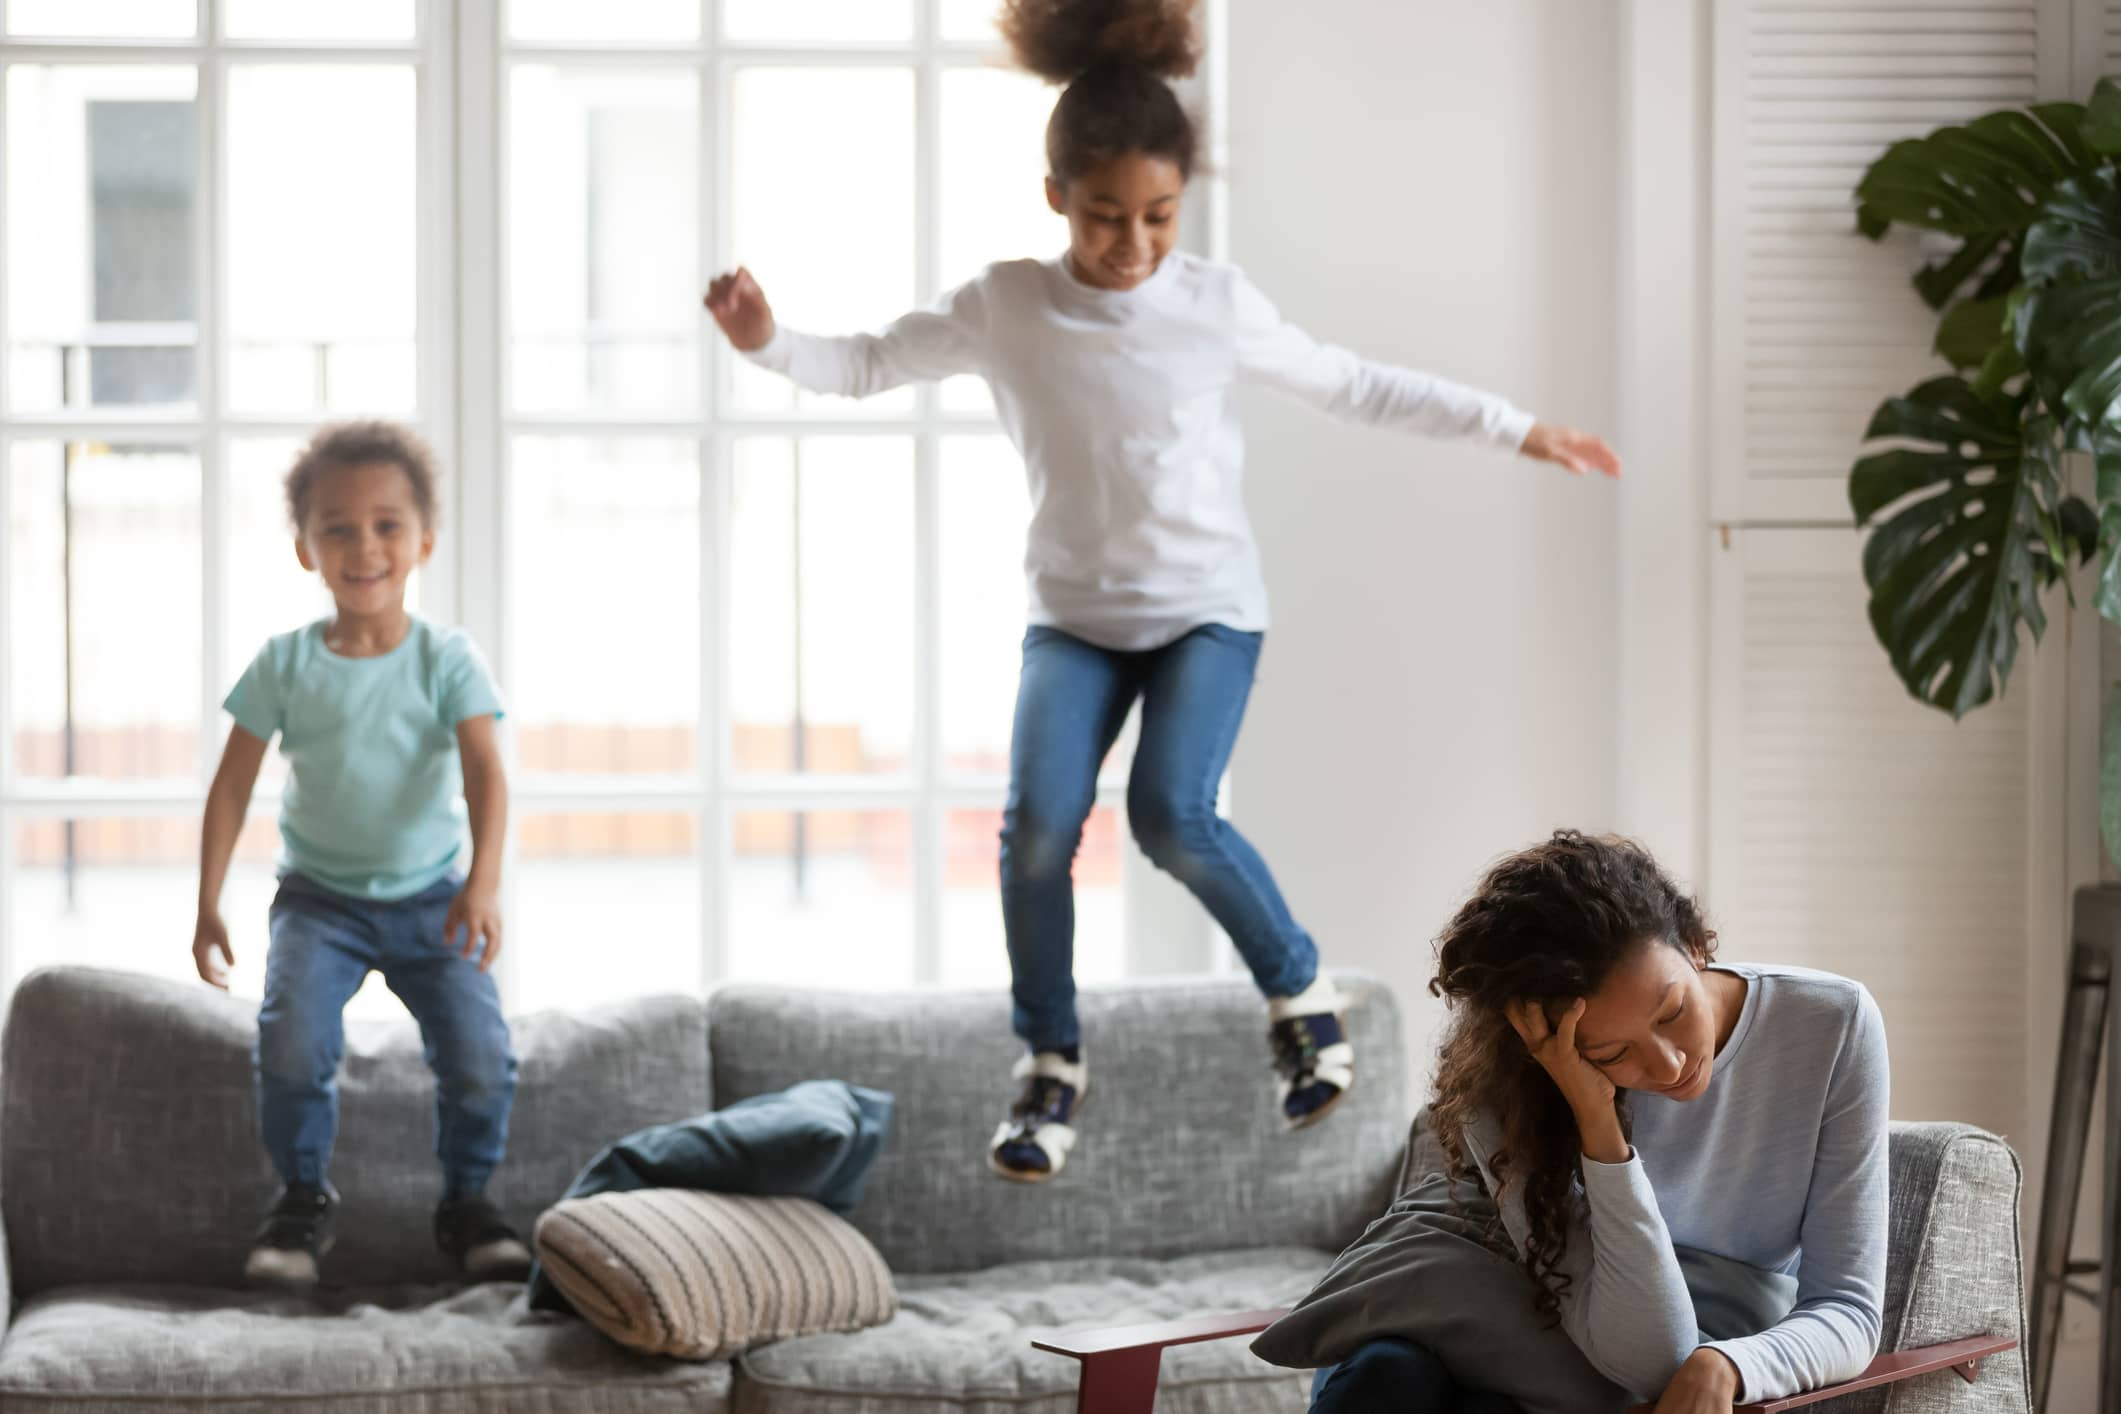 Exhausted mom ignoring misbehavior